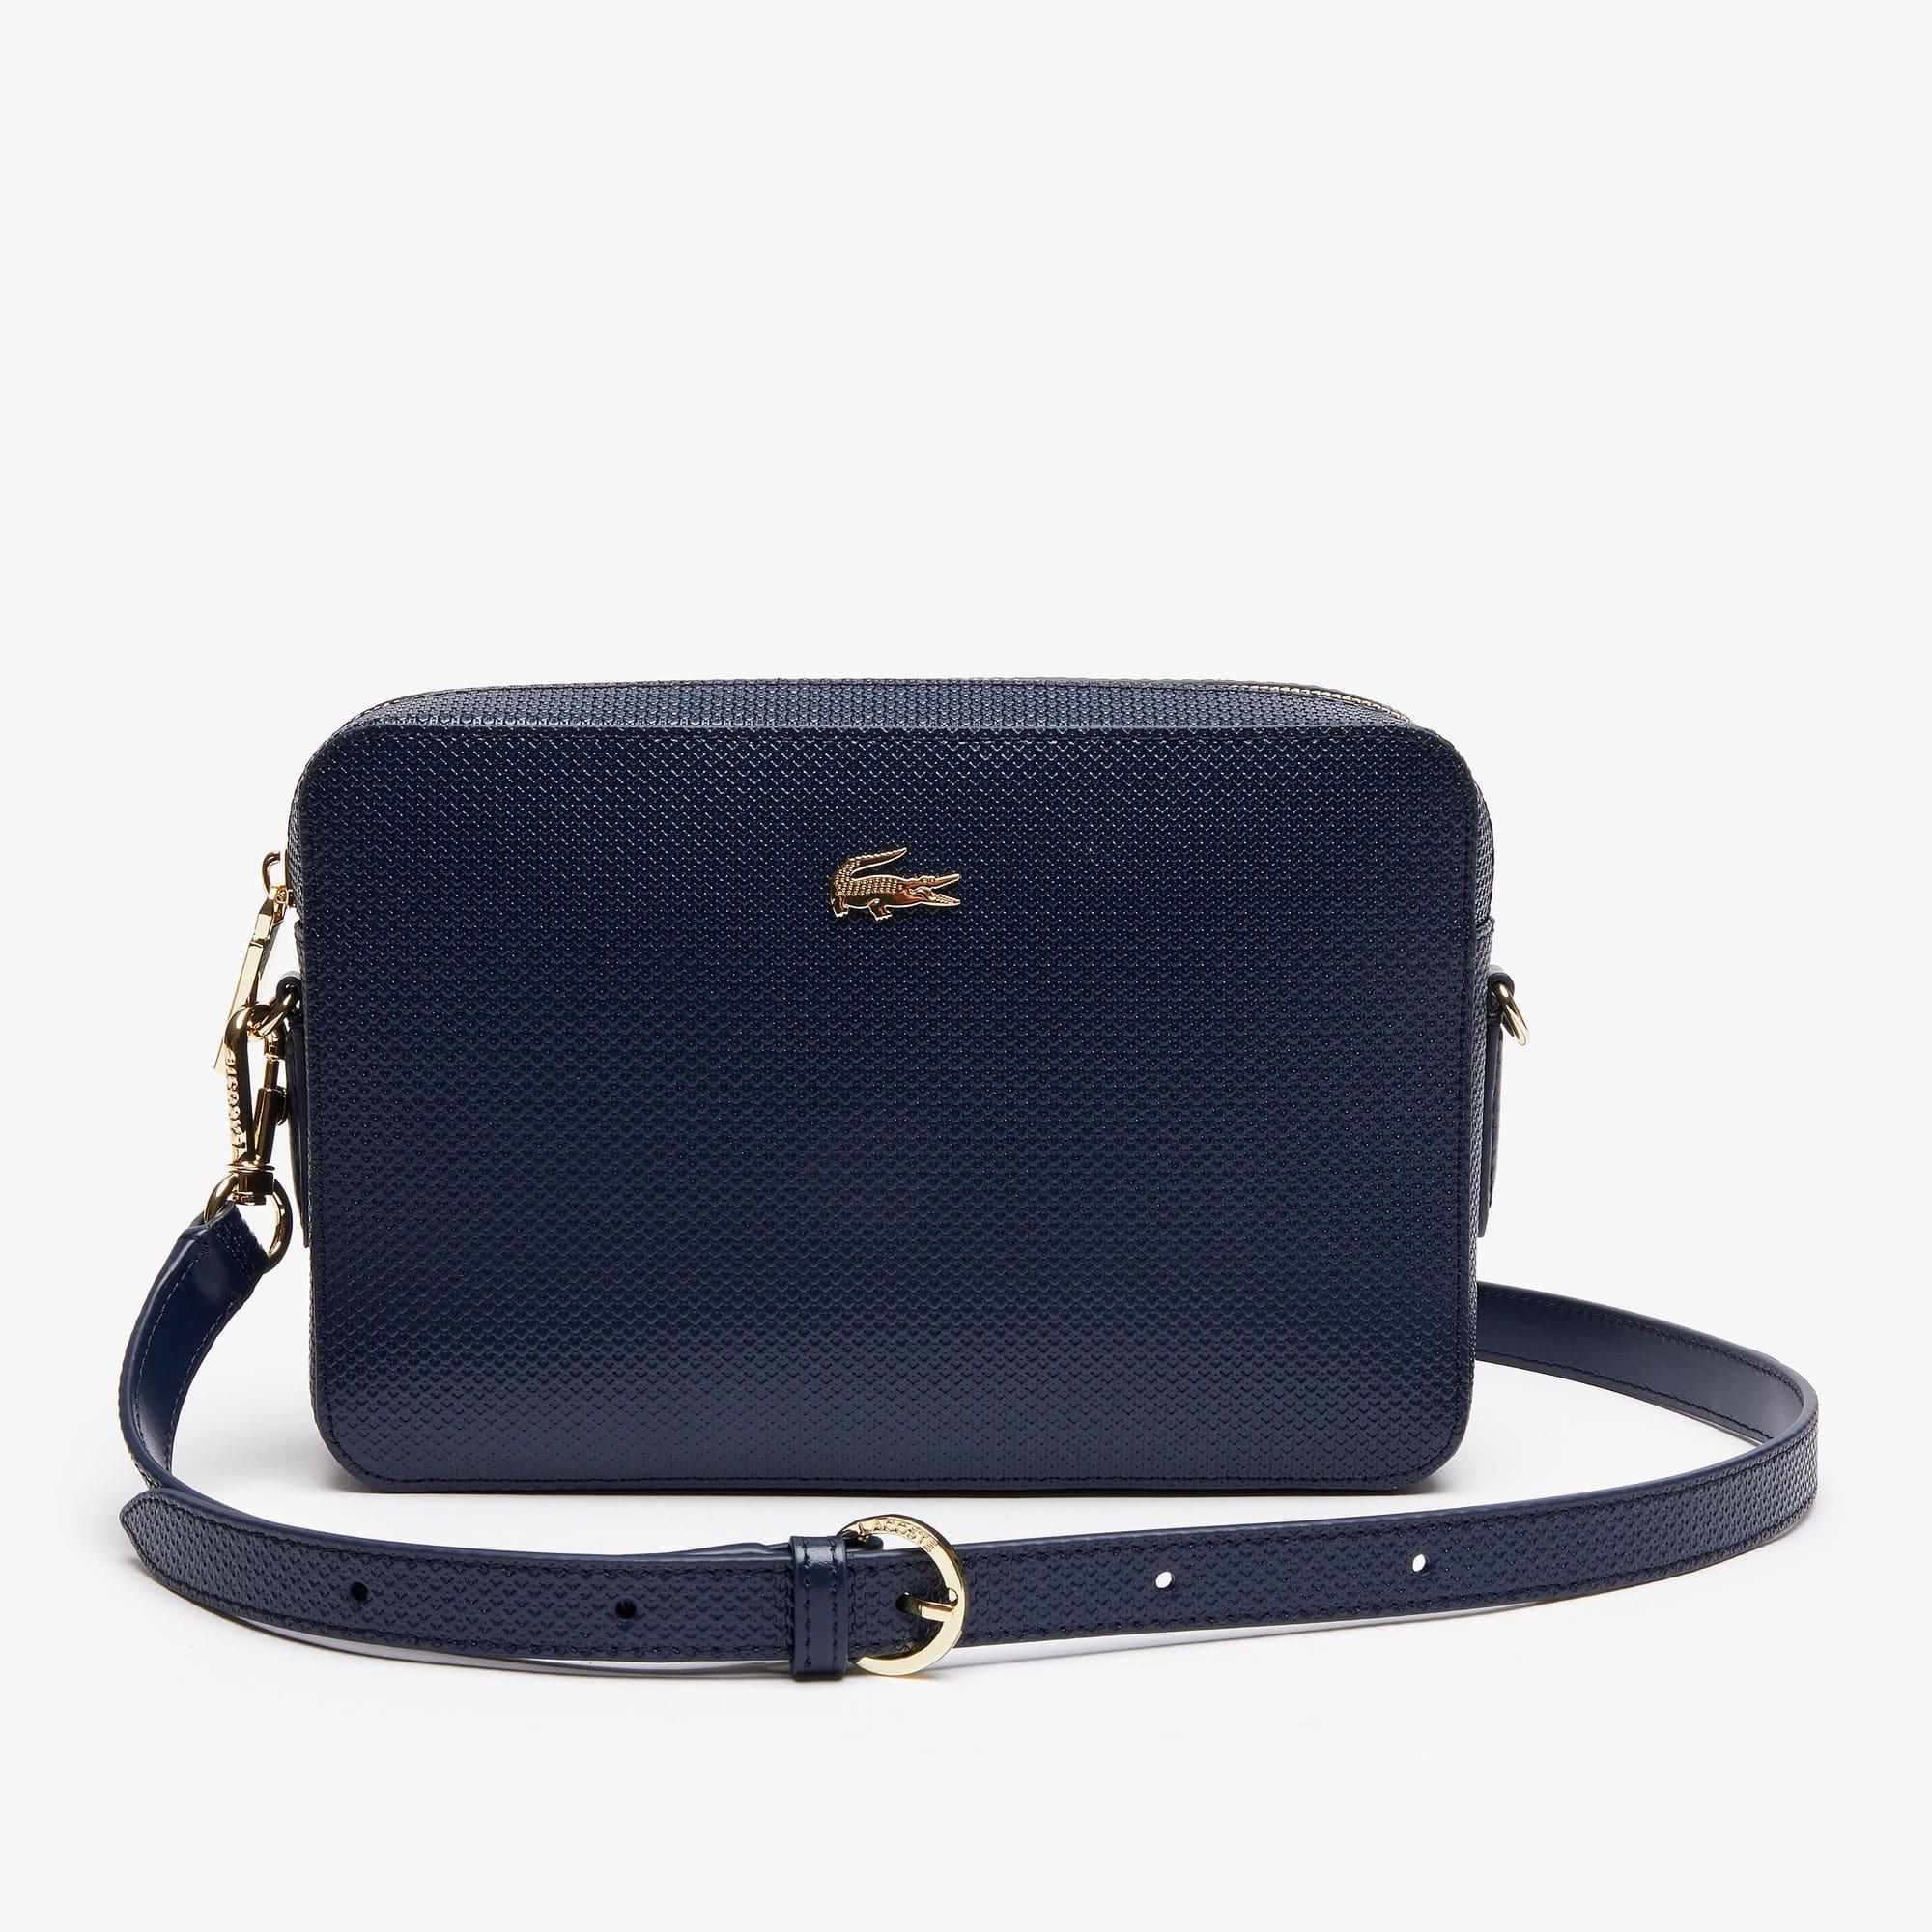 Women's Chantaco Leather Square Shoulder Bag